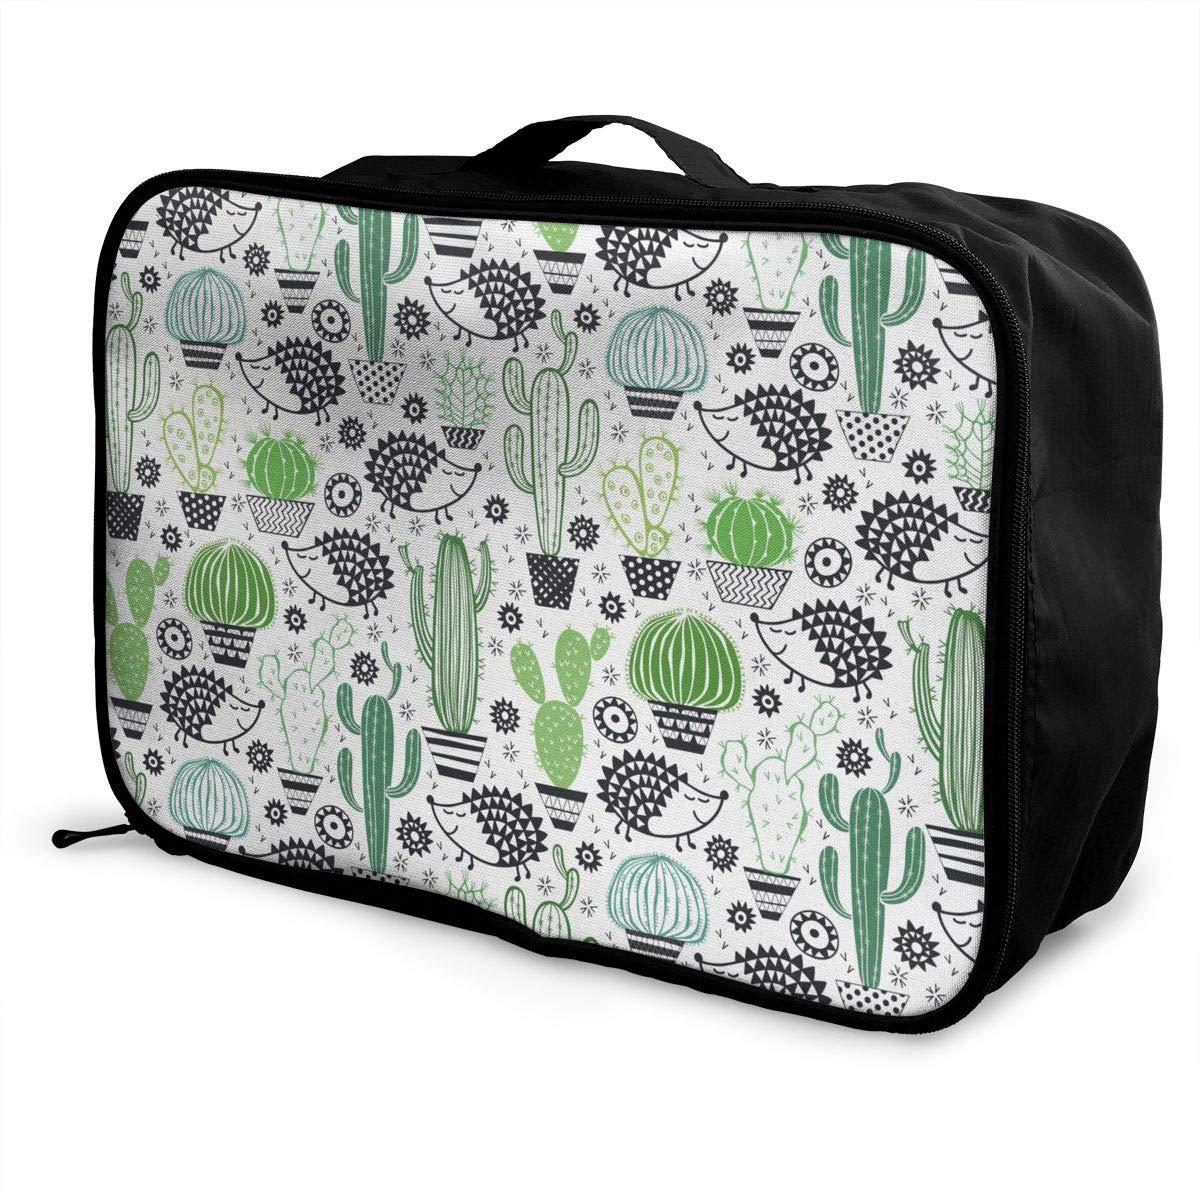 ADGAI Cartoon Style Inspired Drawing Canvas Travel Weekender Bag,Fashion Custom Lightweight Large Capacity Portable Luggage Bag,Suitcase Trolley Bag